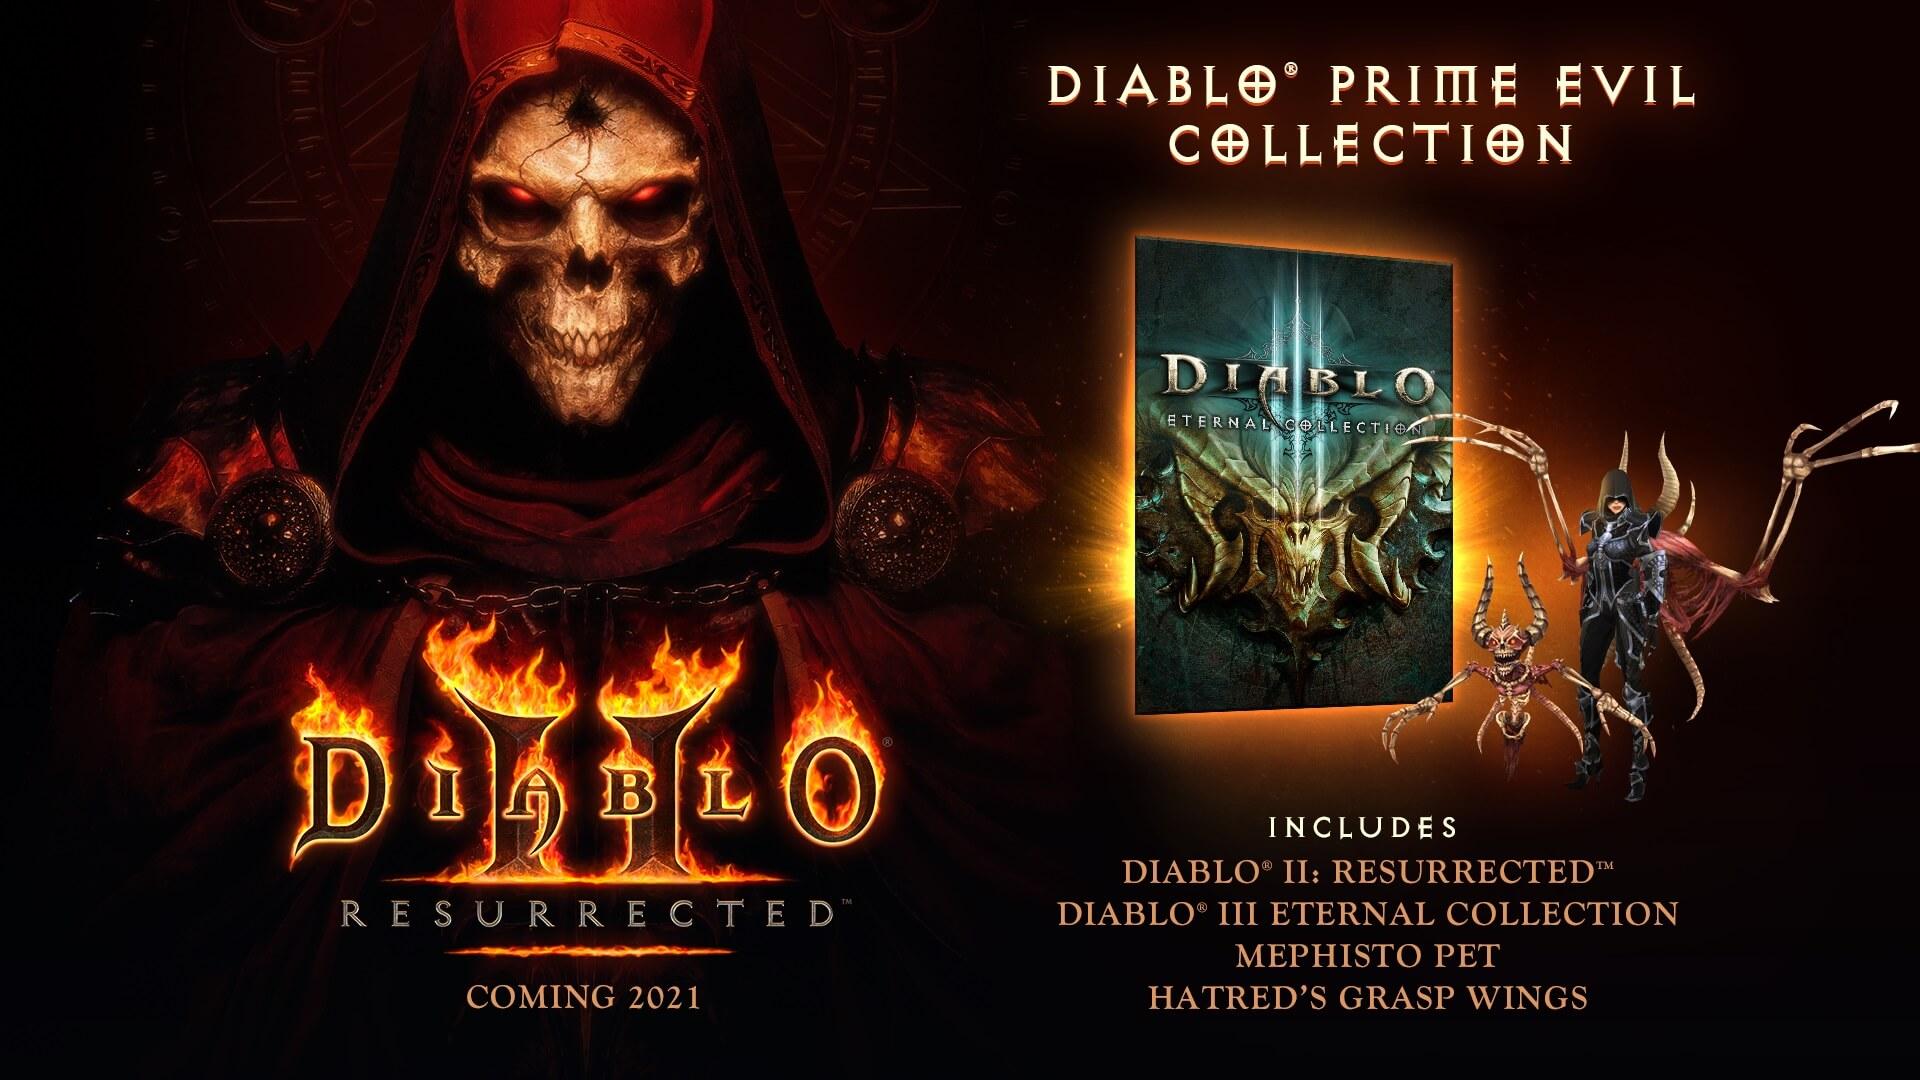 Diablo 2: Resurrected: Prime Evil Edition